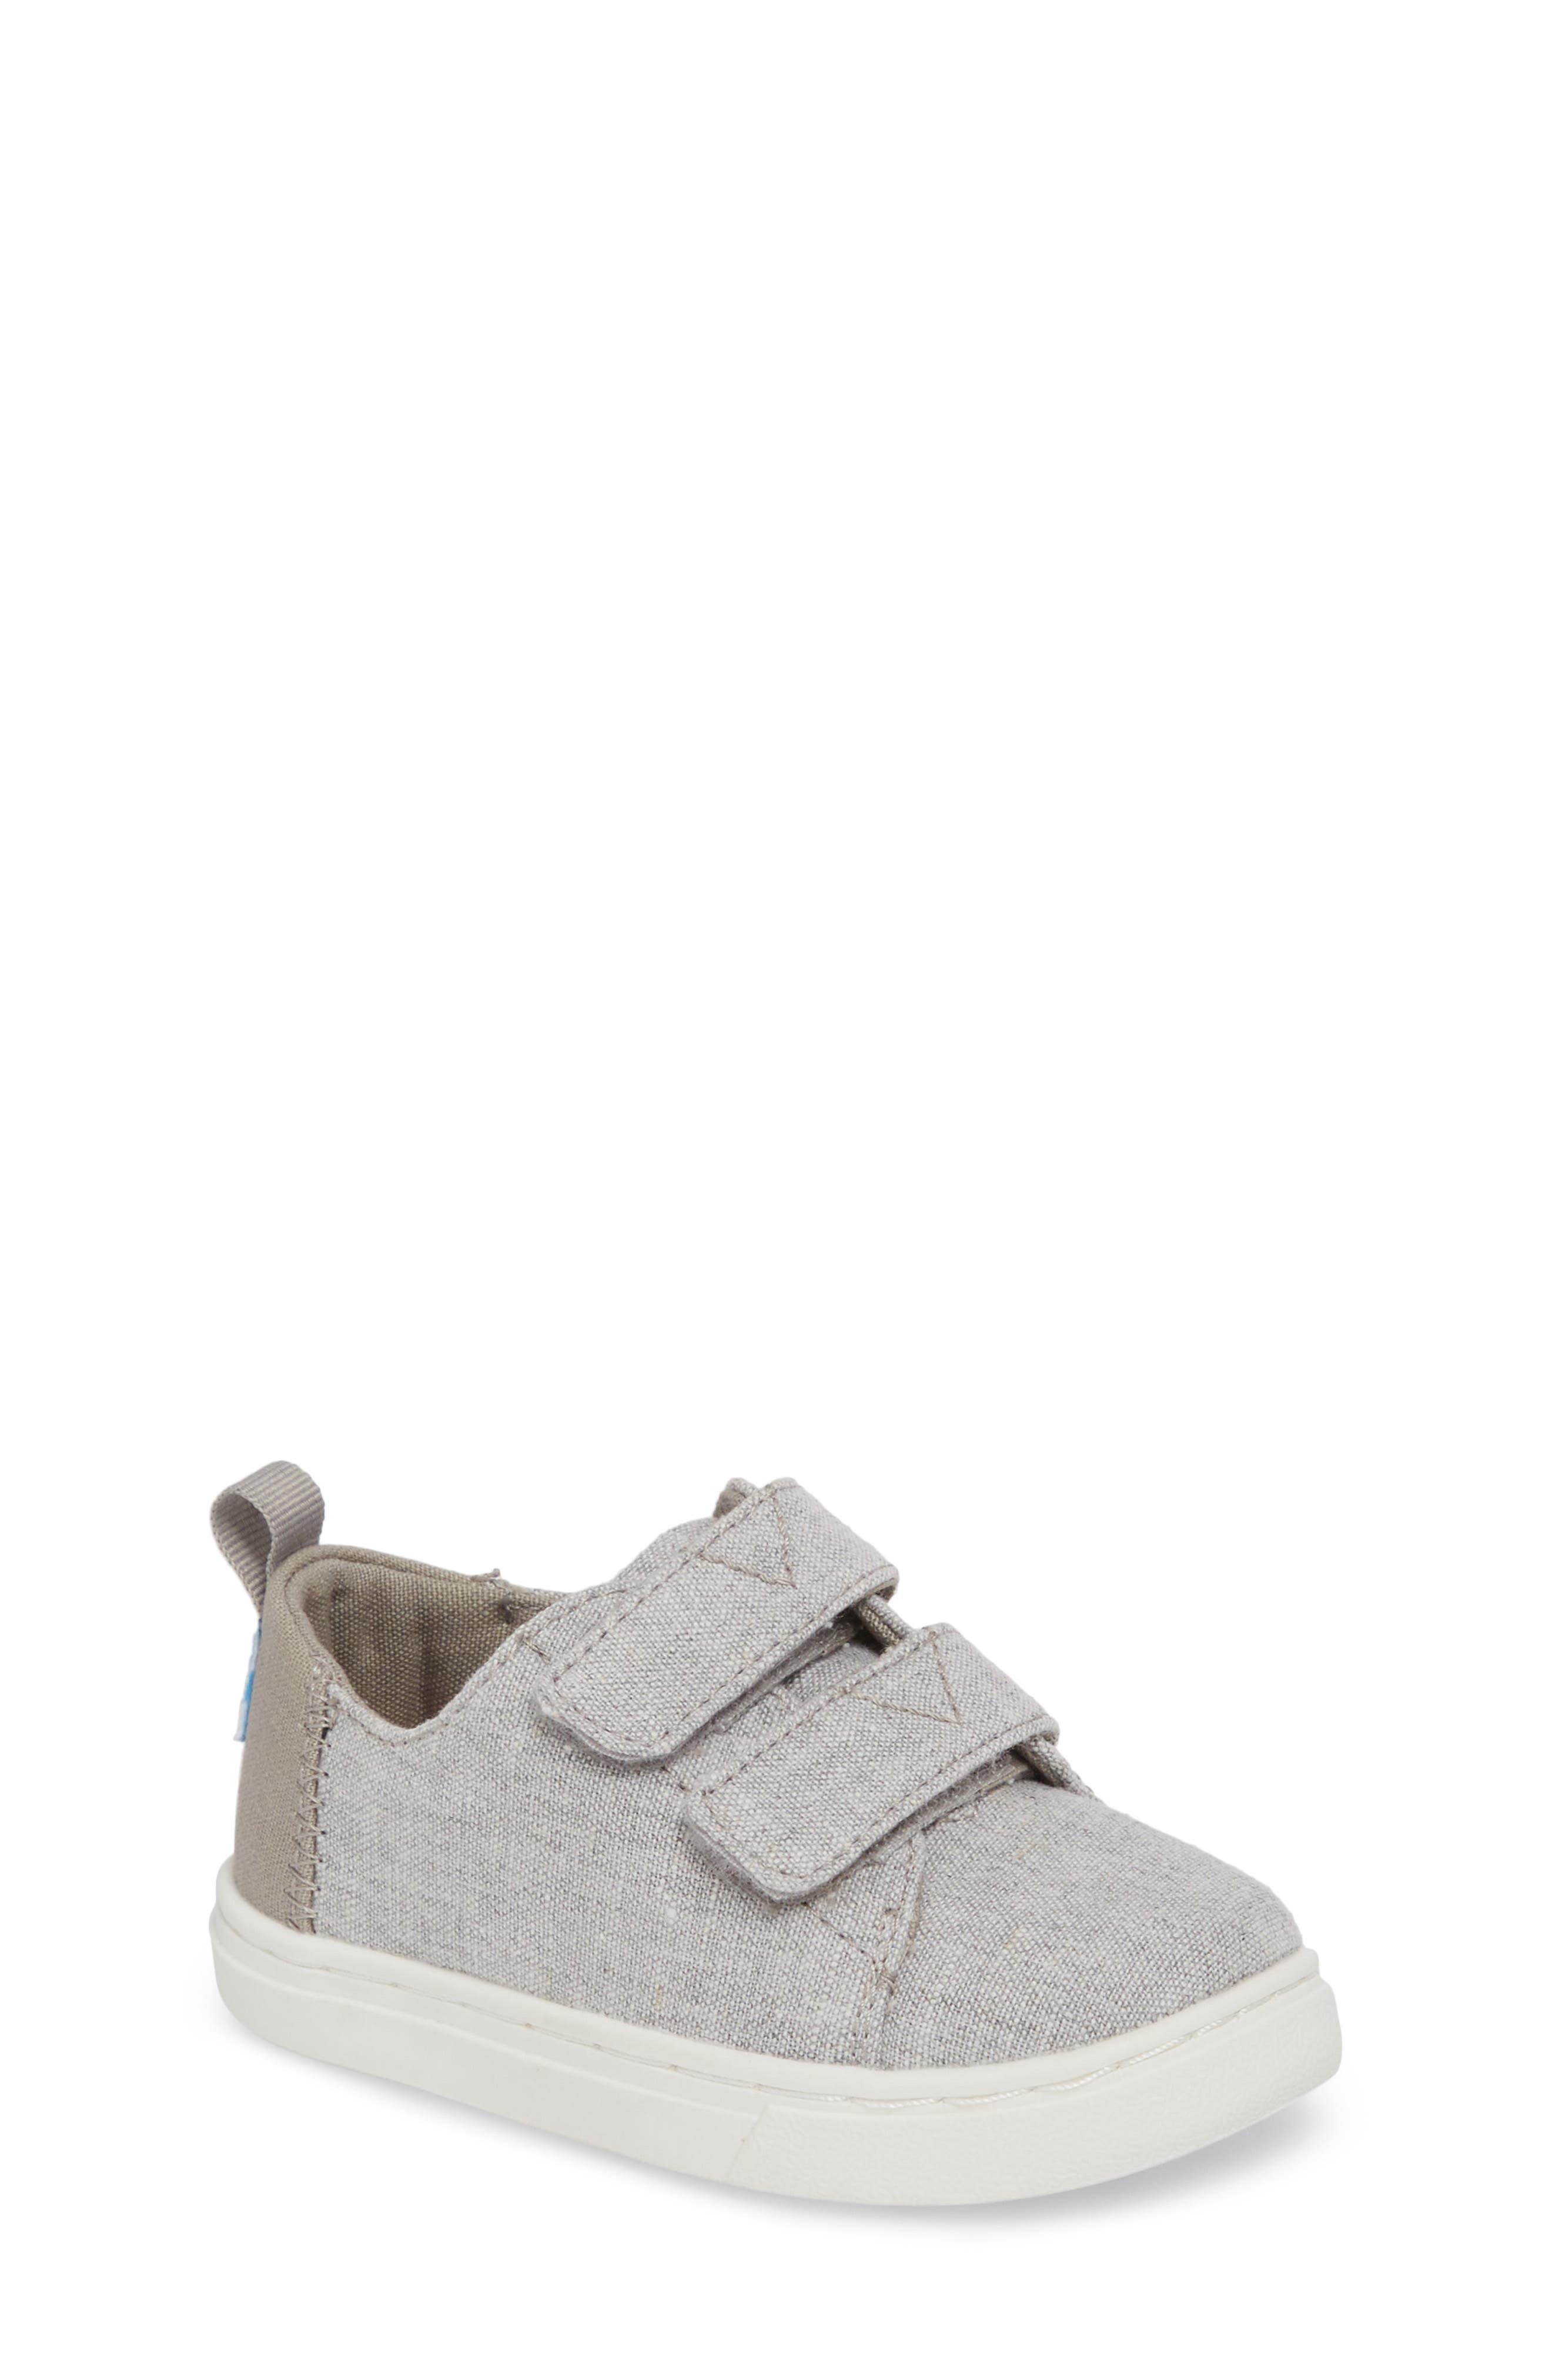 Lenny Sneaker,                             Main thumbnail 1, color,                             Drizzle Grey Chambray